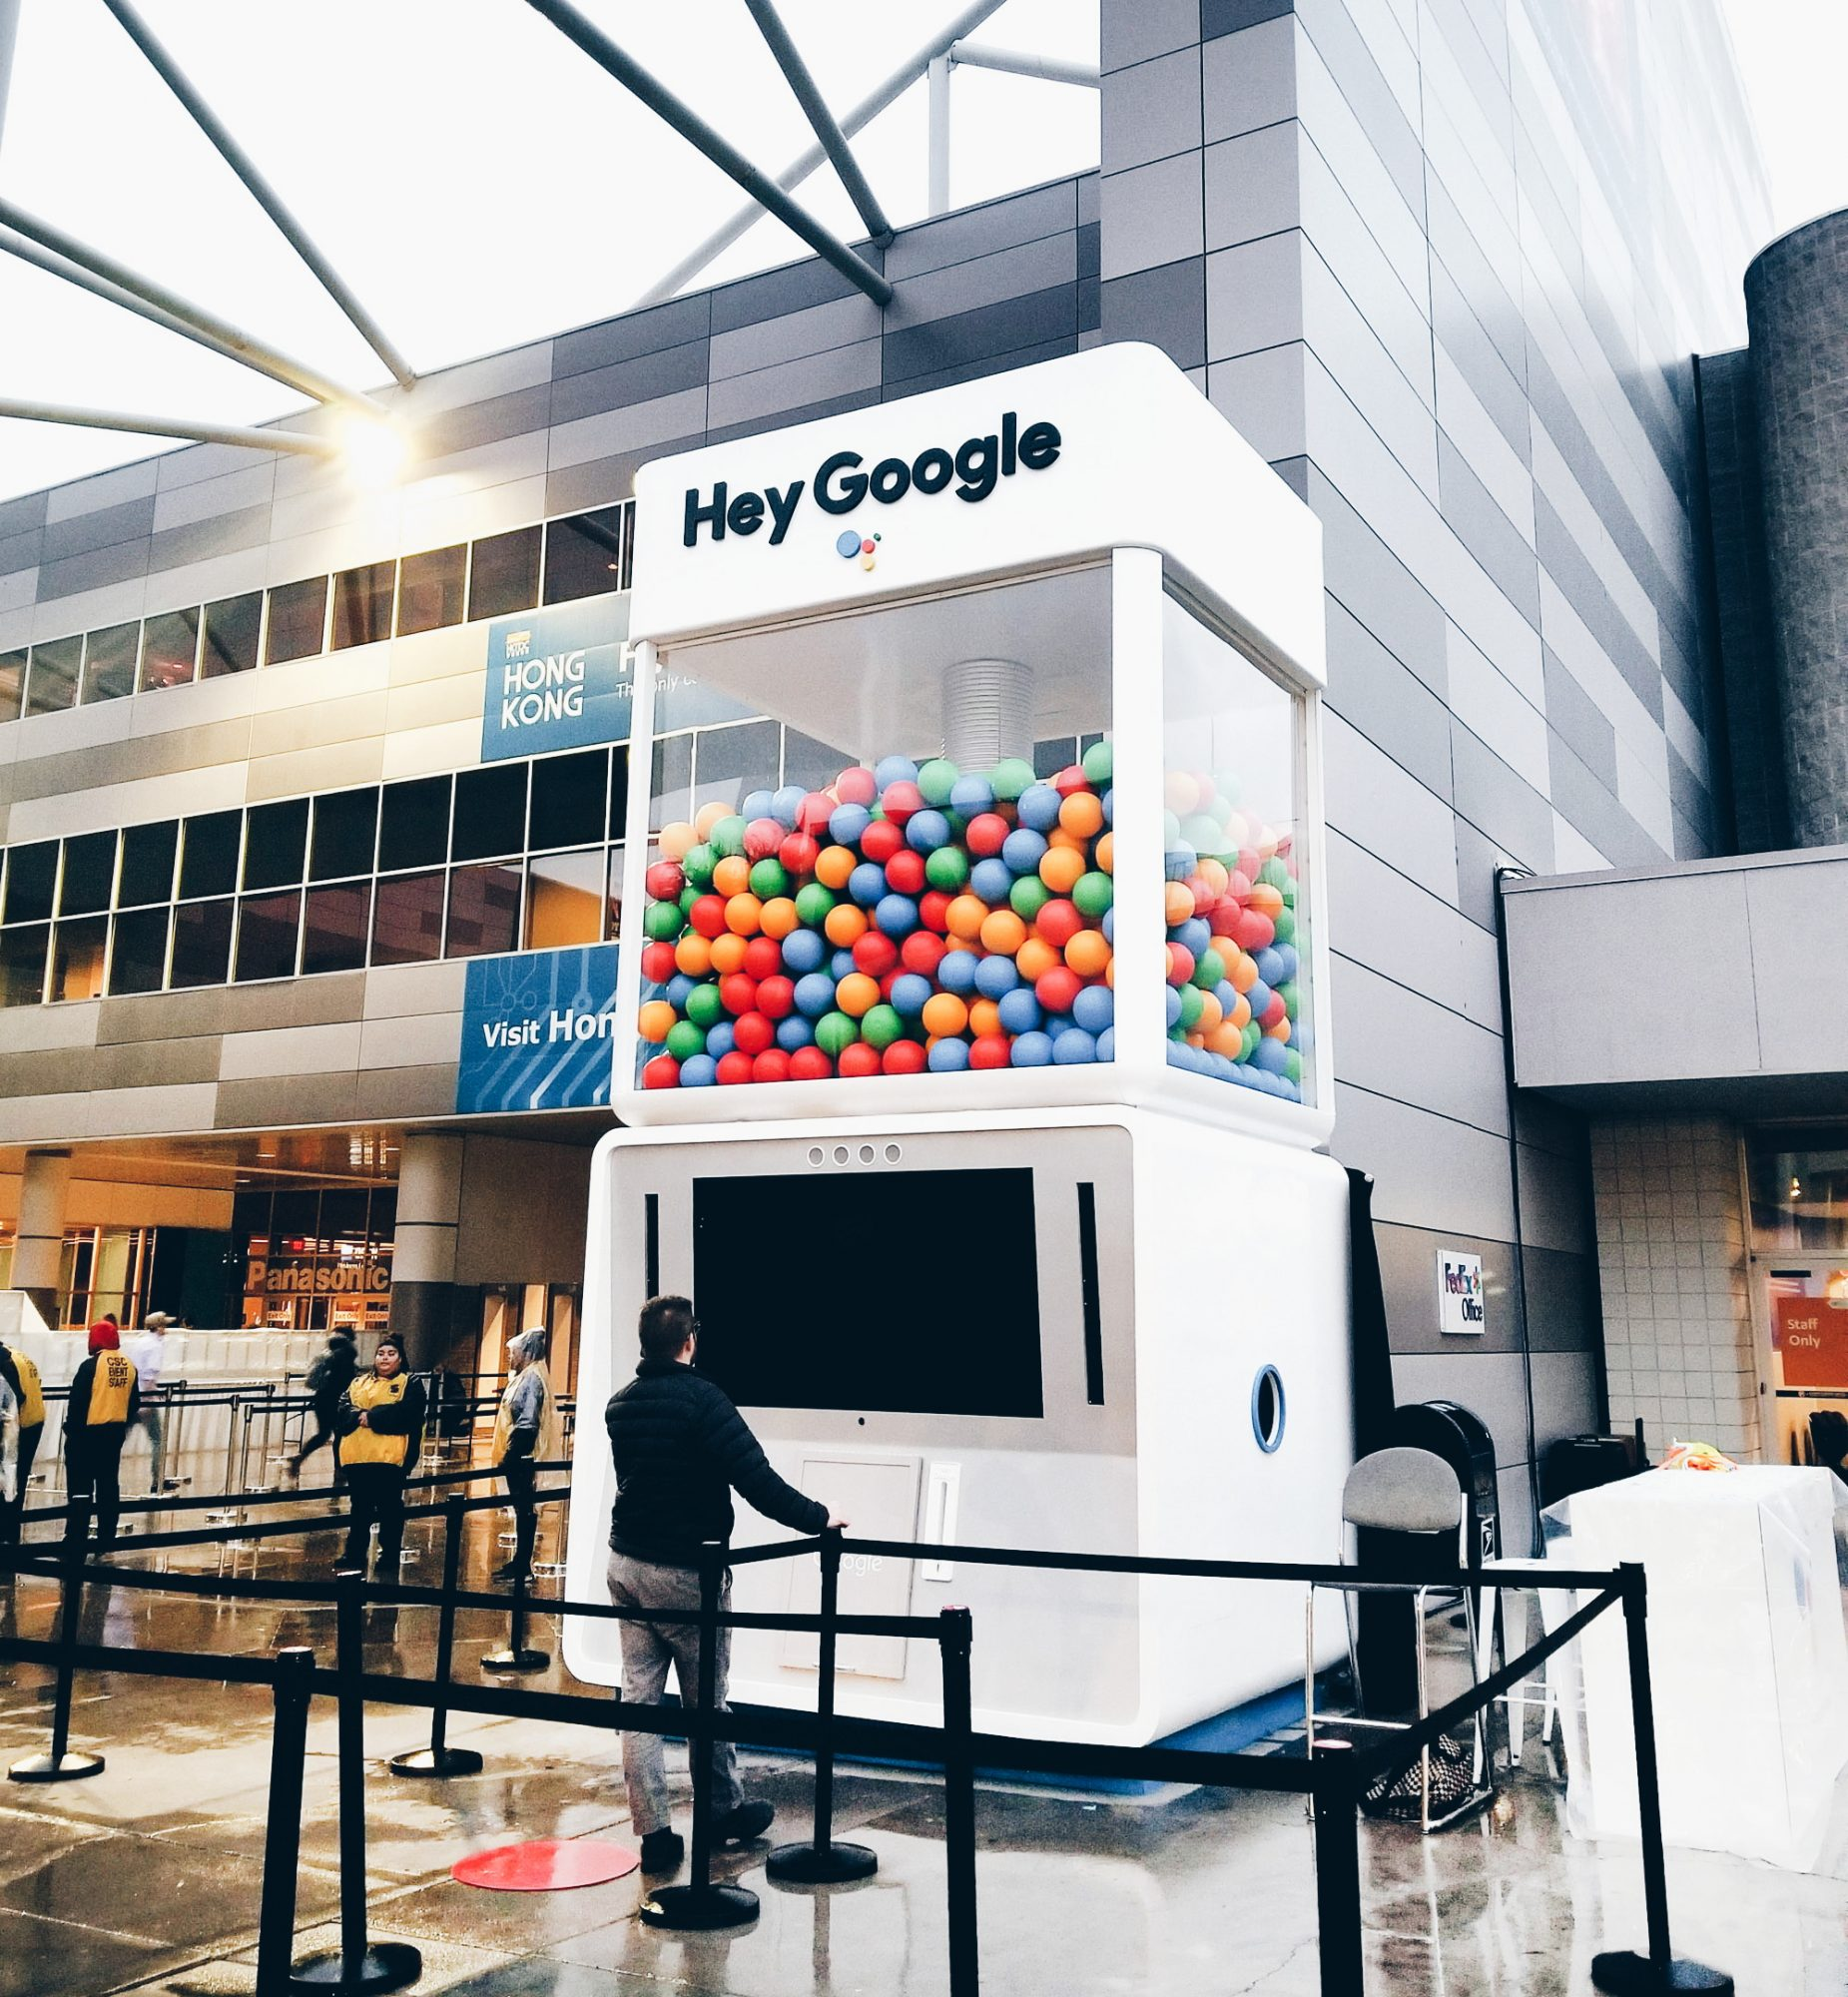 Las Vegas Convention Center Hey Google